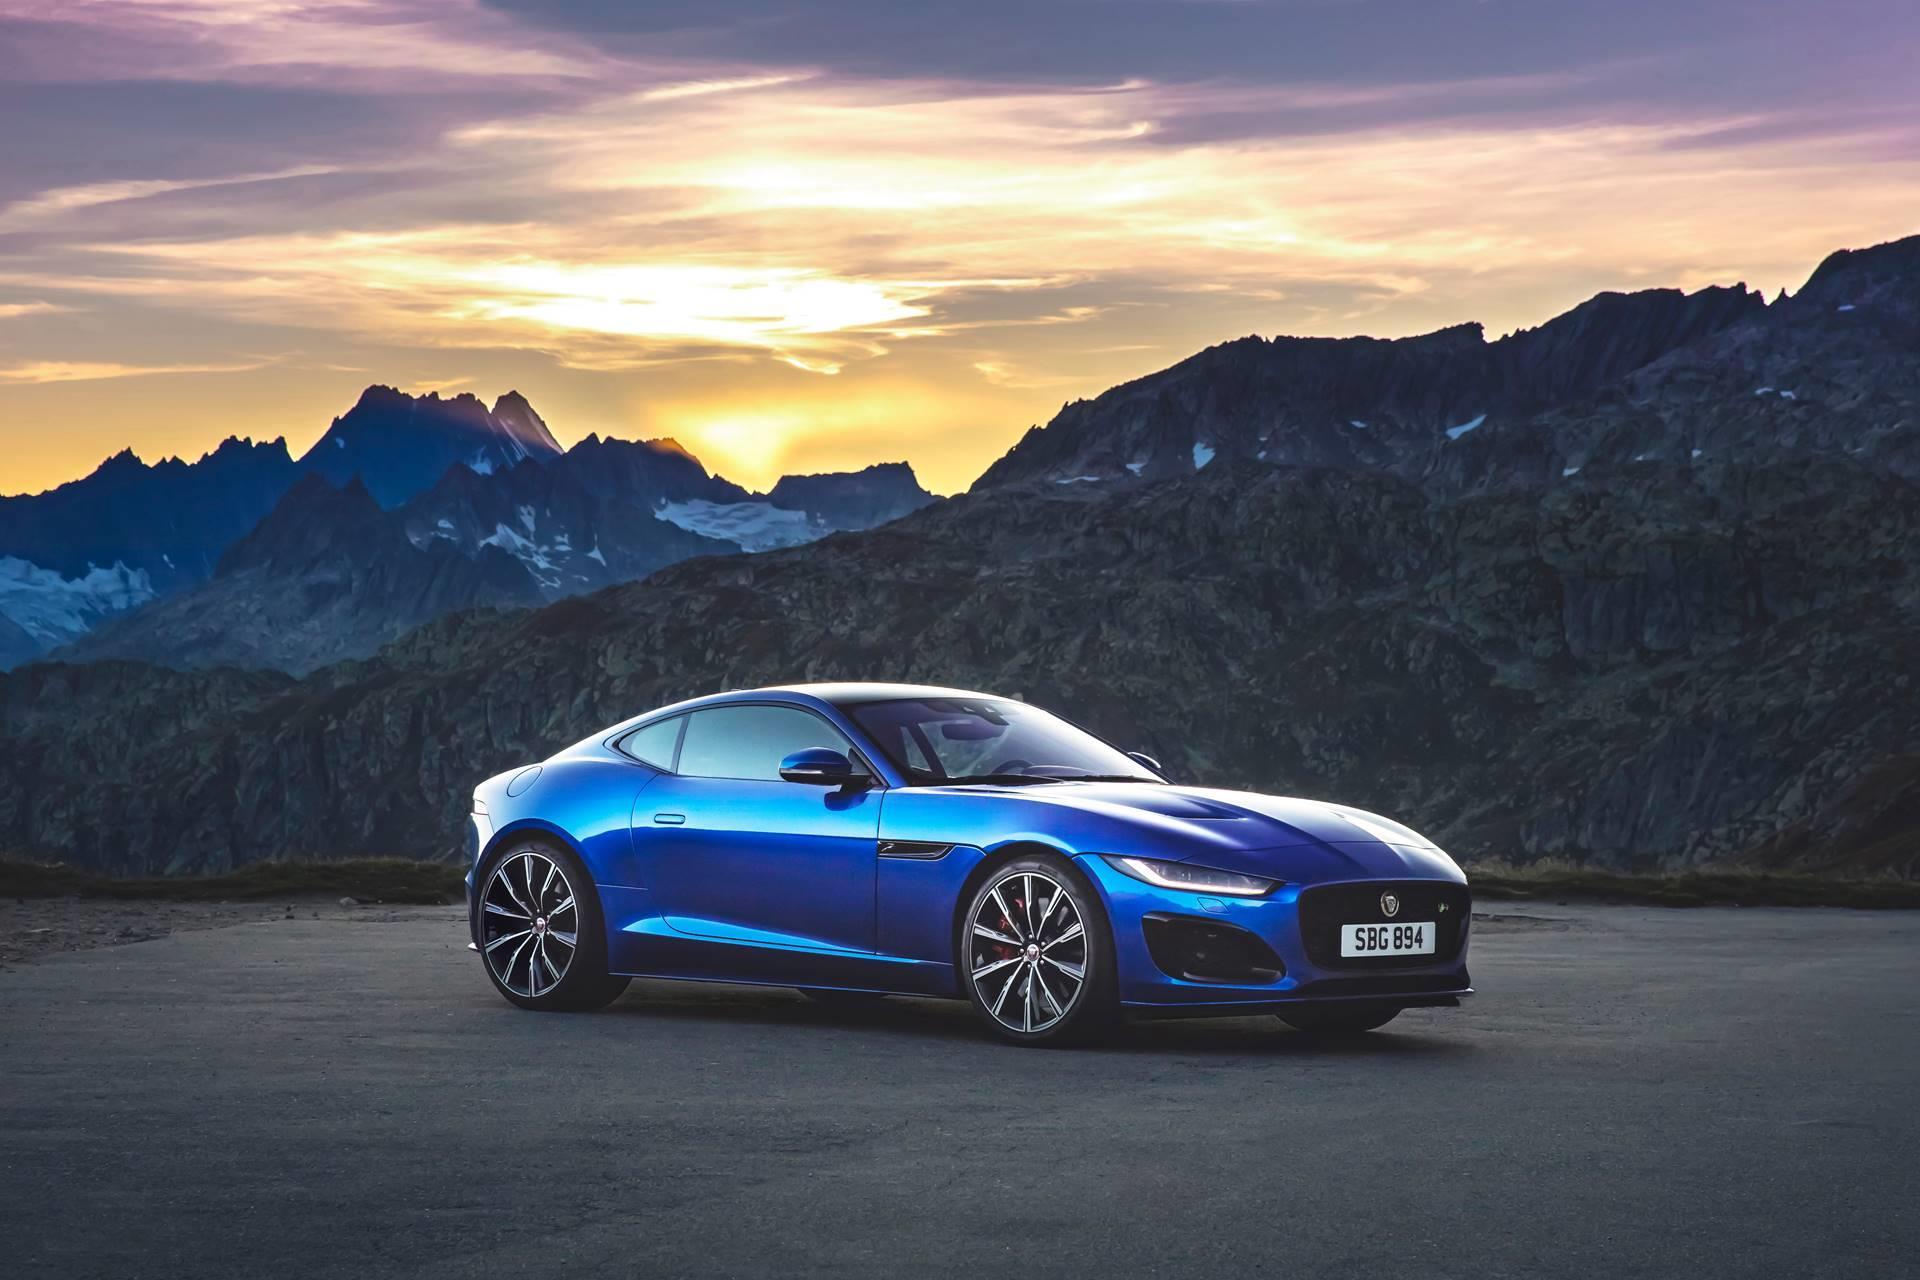 2020 Jaguar F-Type News and Information   conceptcarz.com